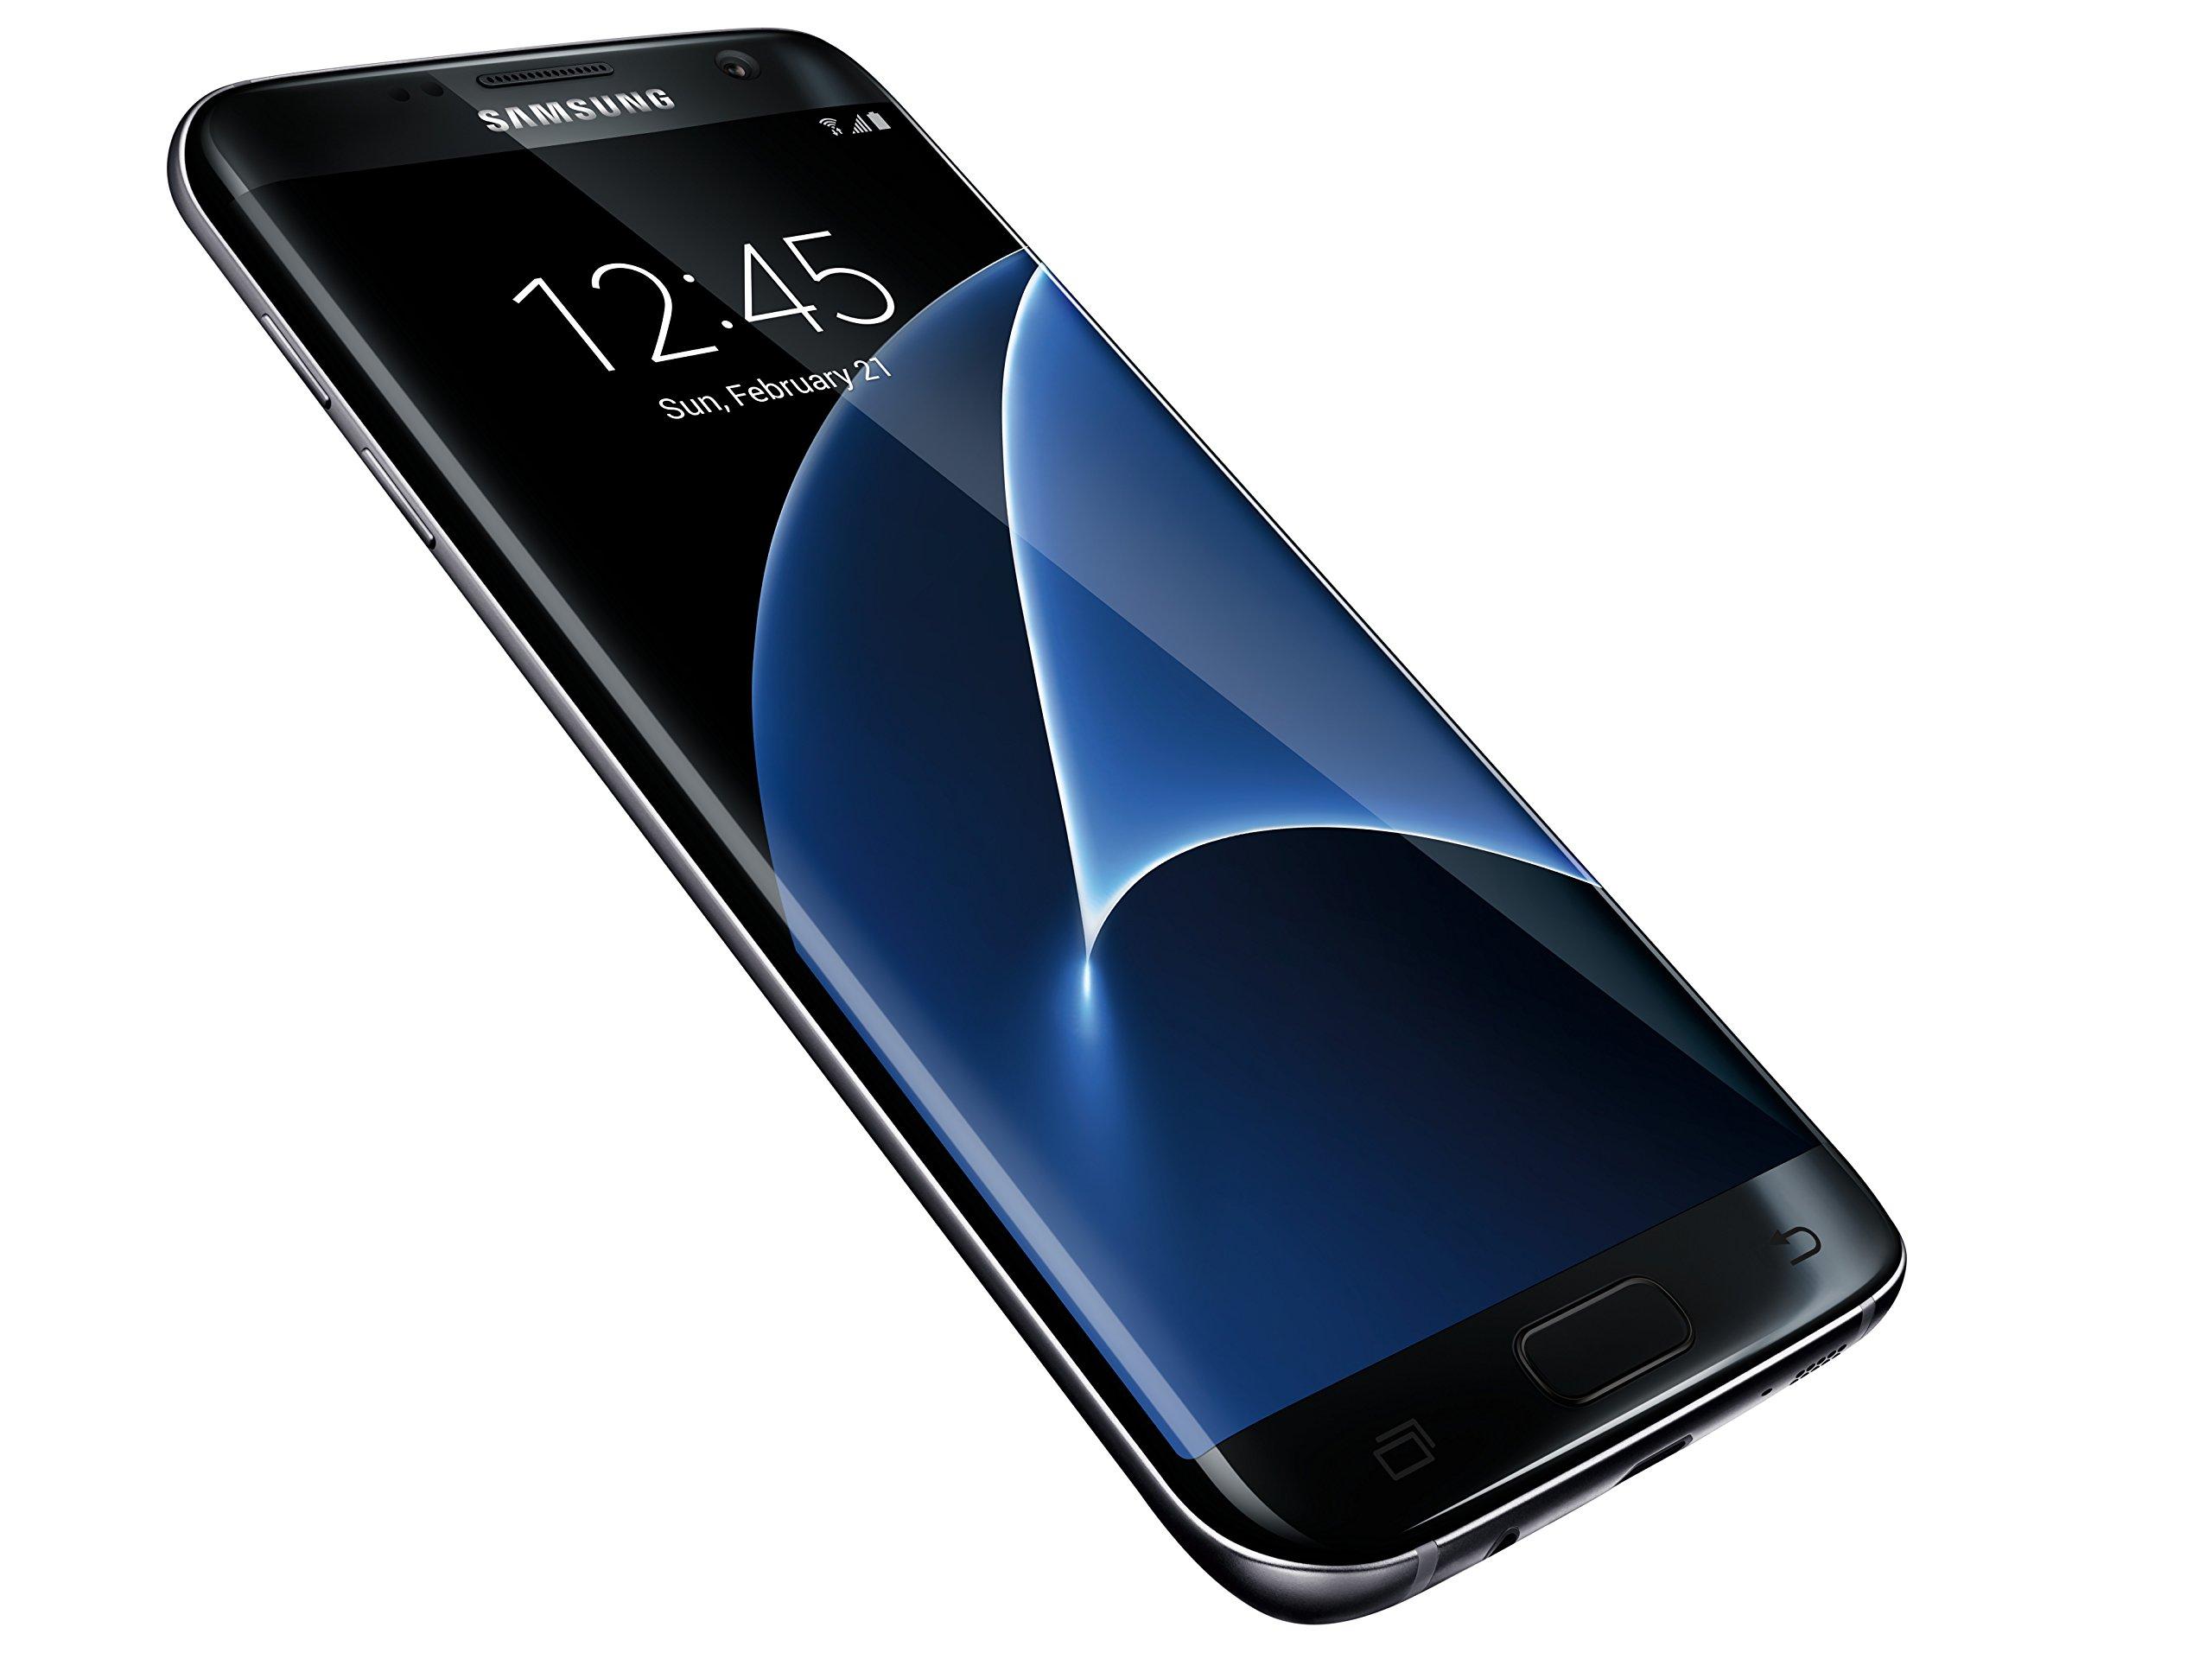 Samsung Galaxy S7 Edge G935F Factory Unlocked Phone 32 GB, No Warranty - International Version (Black Onyx) by Samsung (Image #10)